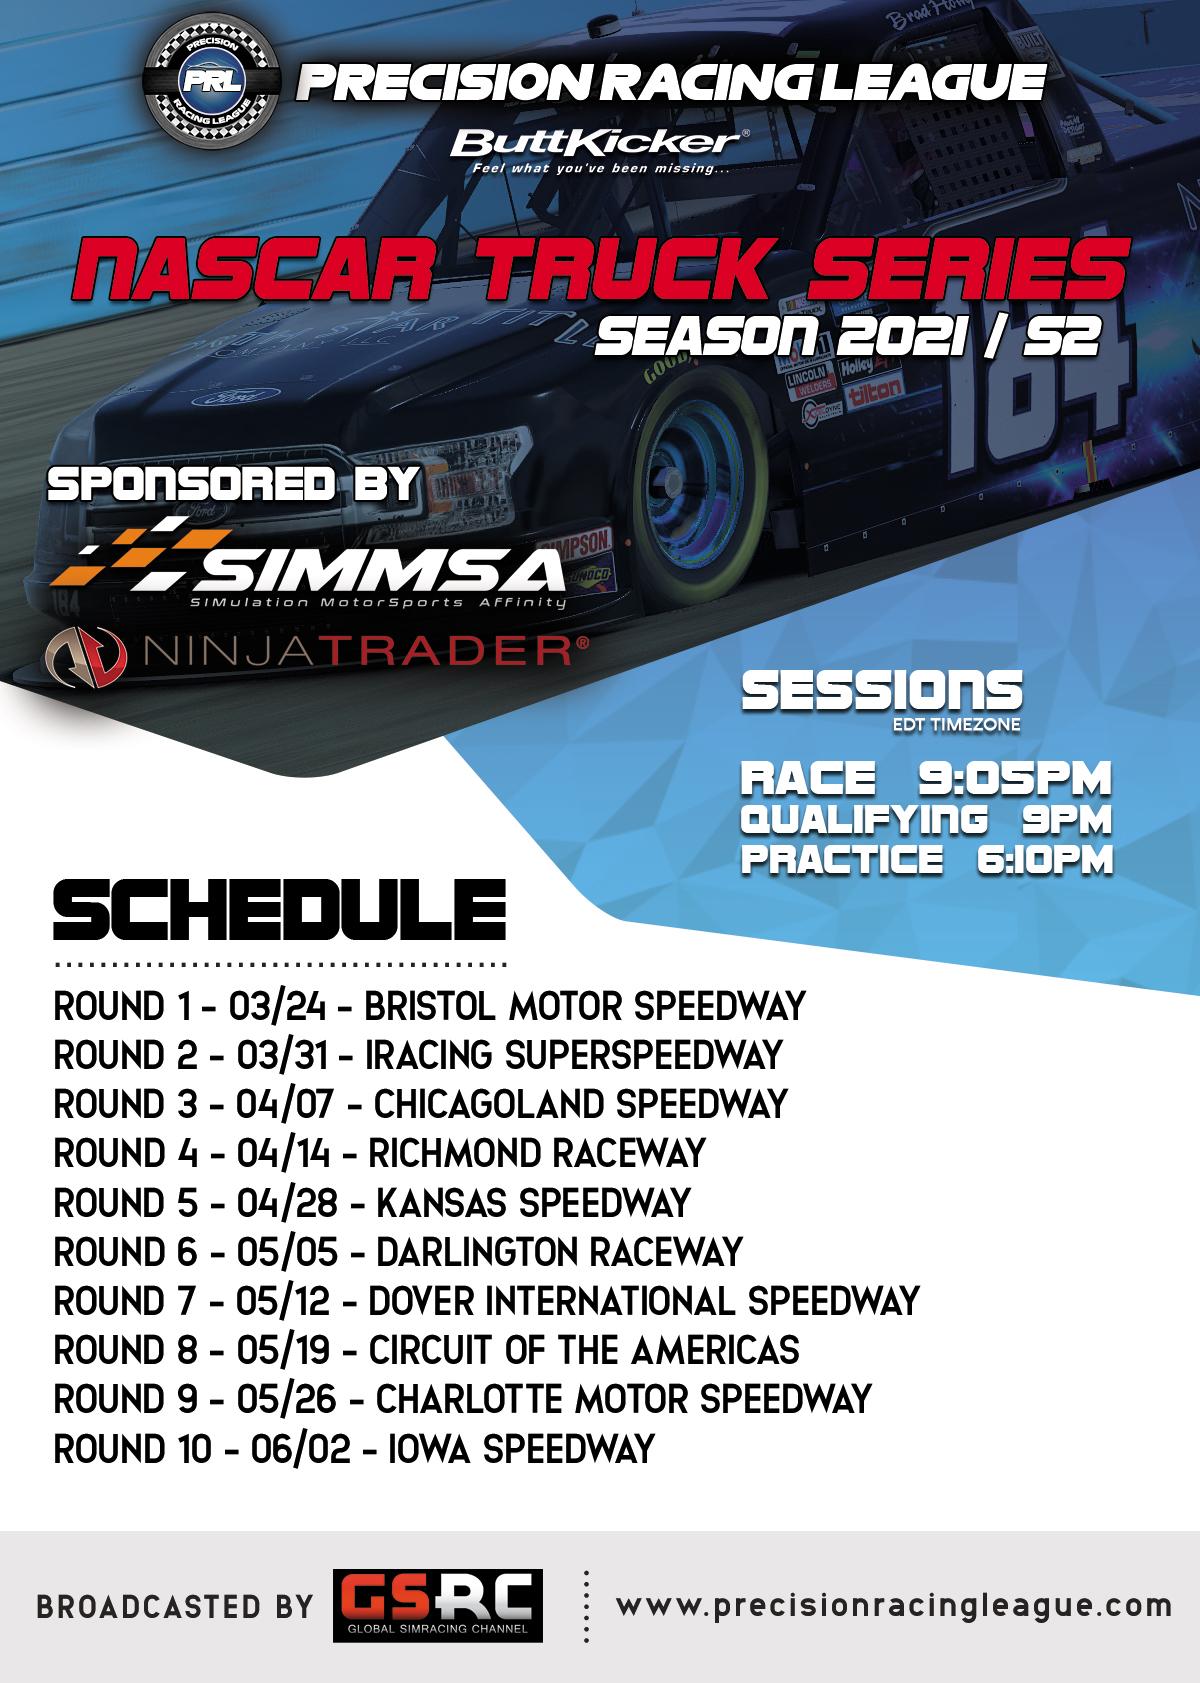 2021S2-NASCAR-TRUCK-SERIES.jpg